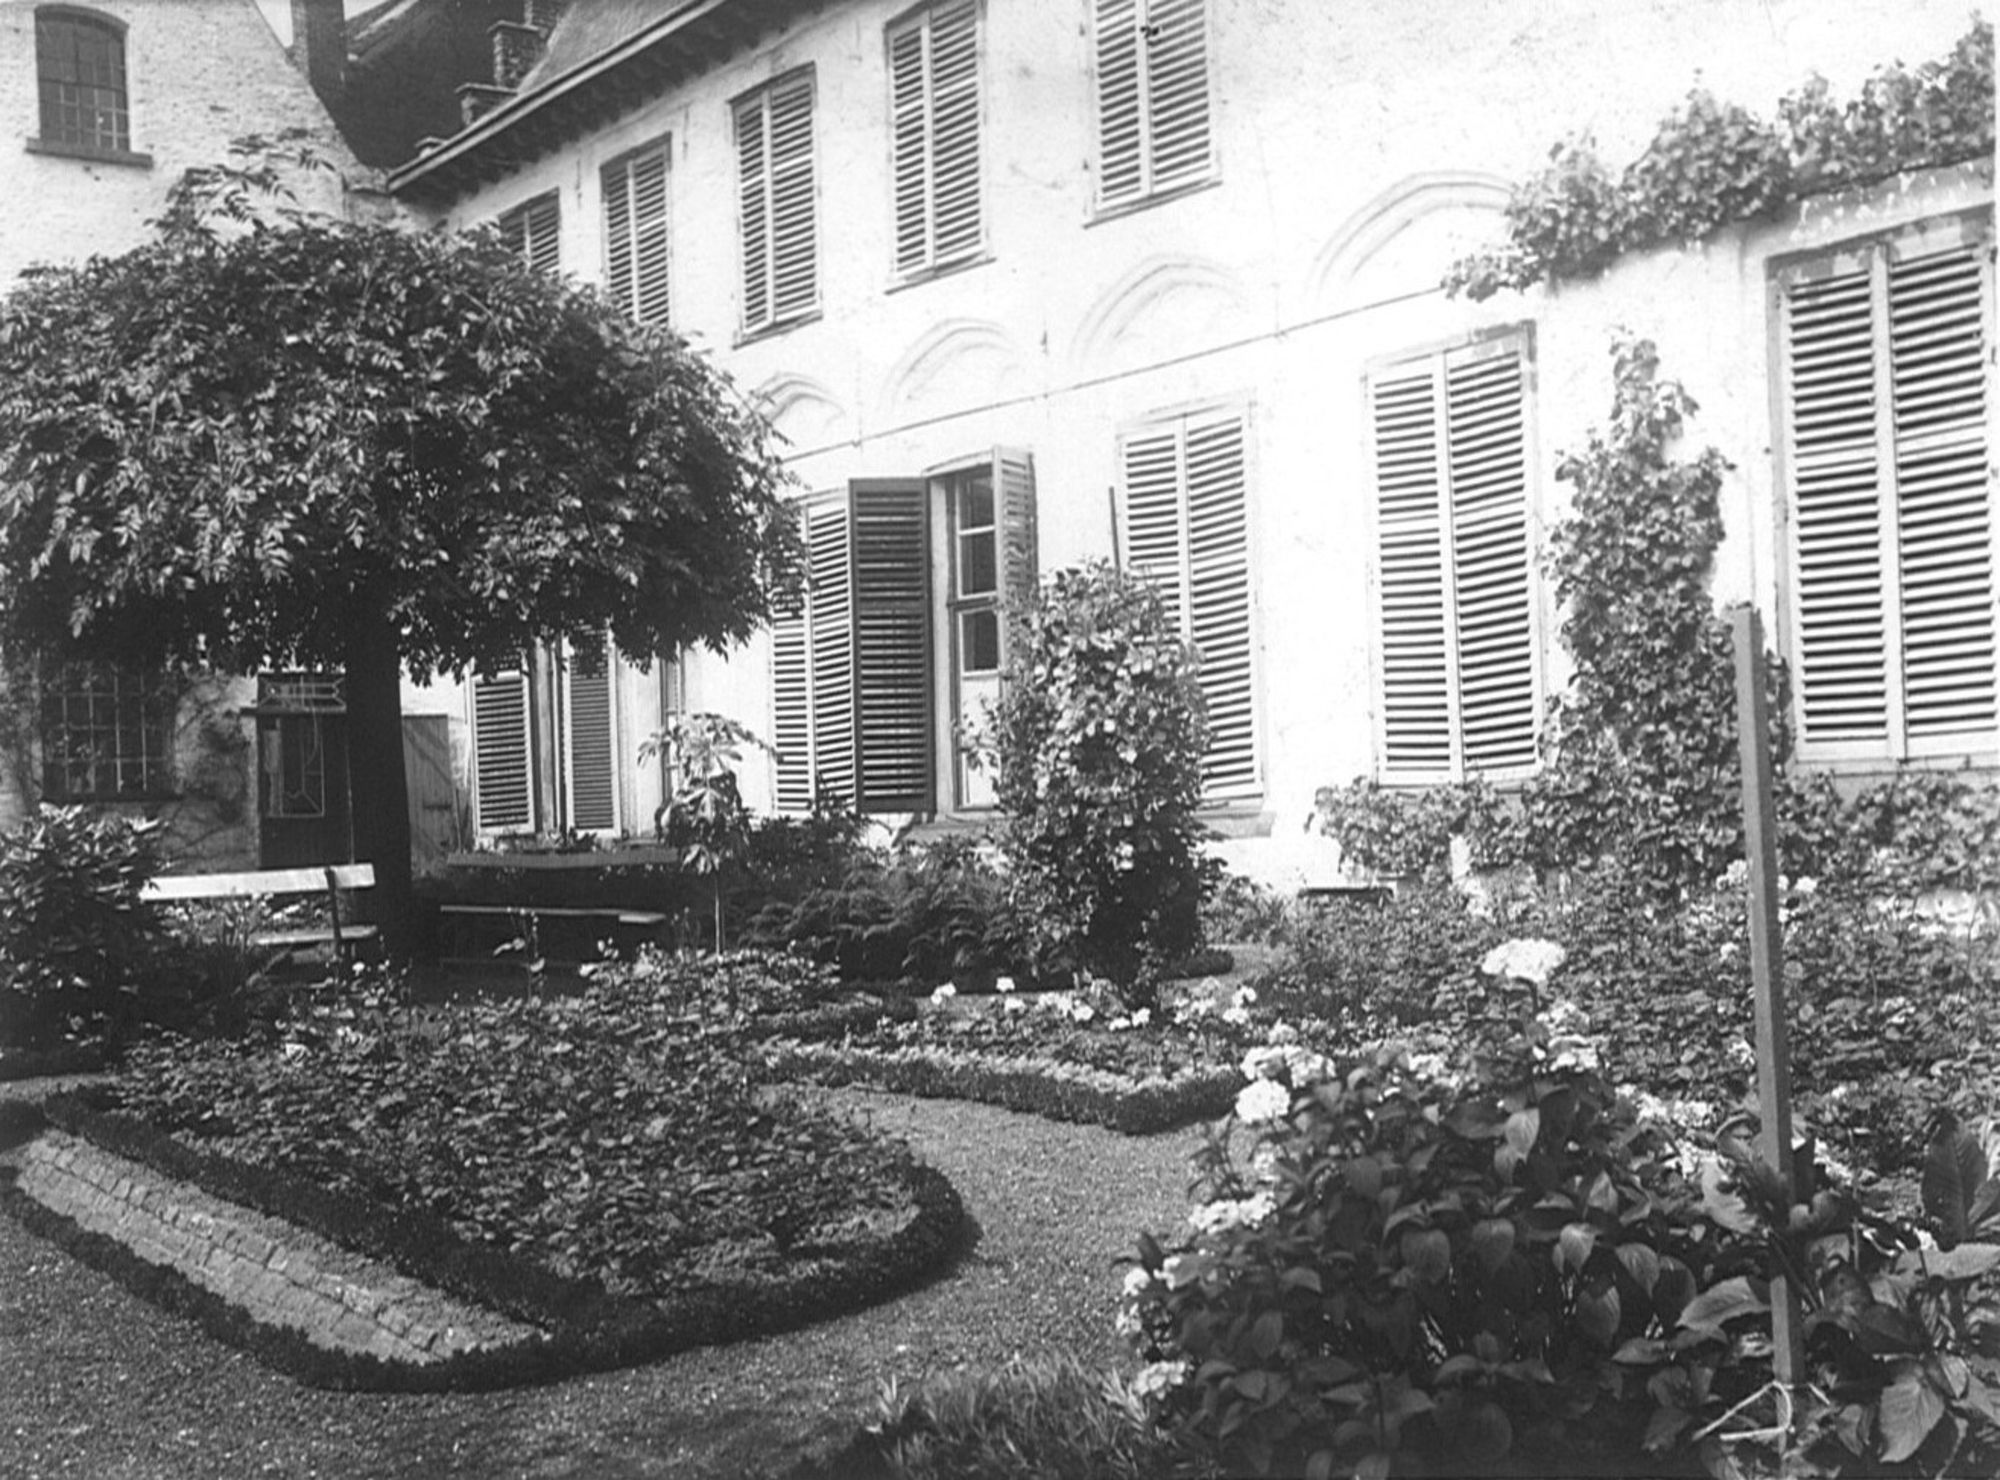 Tuin Onze-Lieve-Vrouwehospitaal